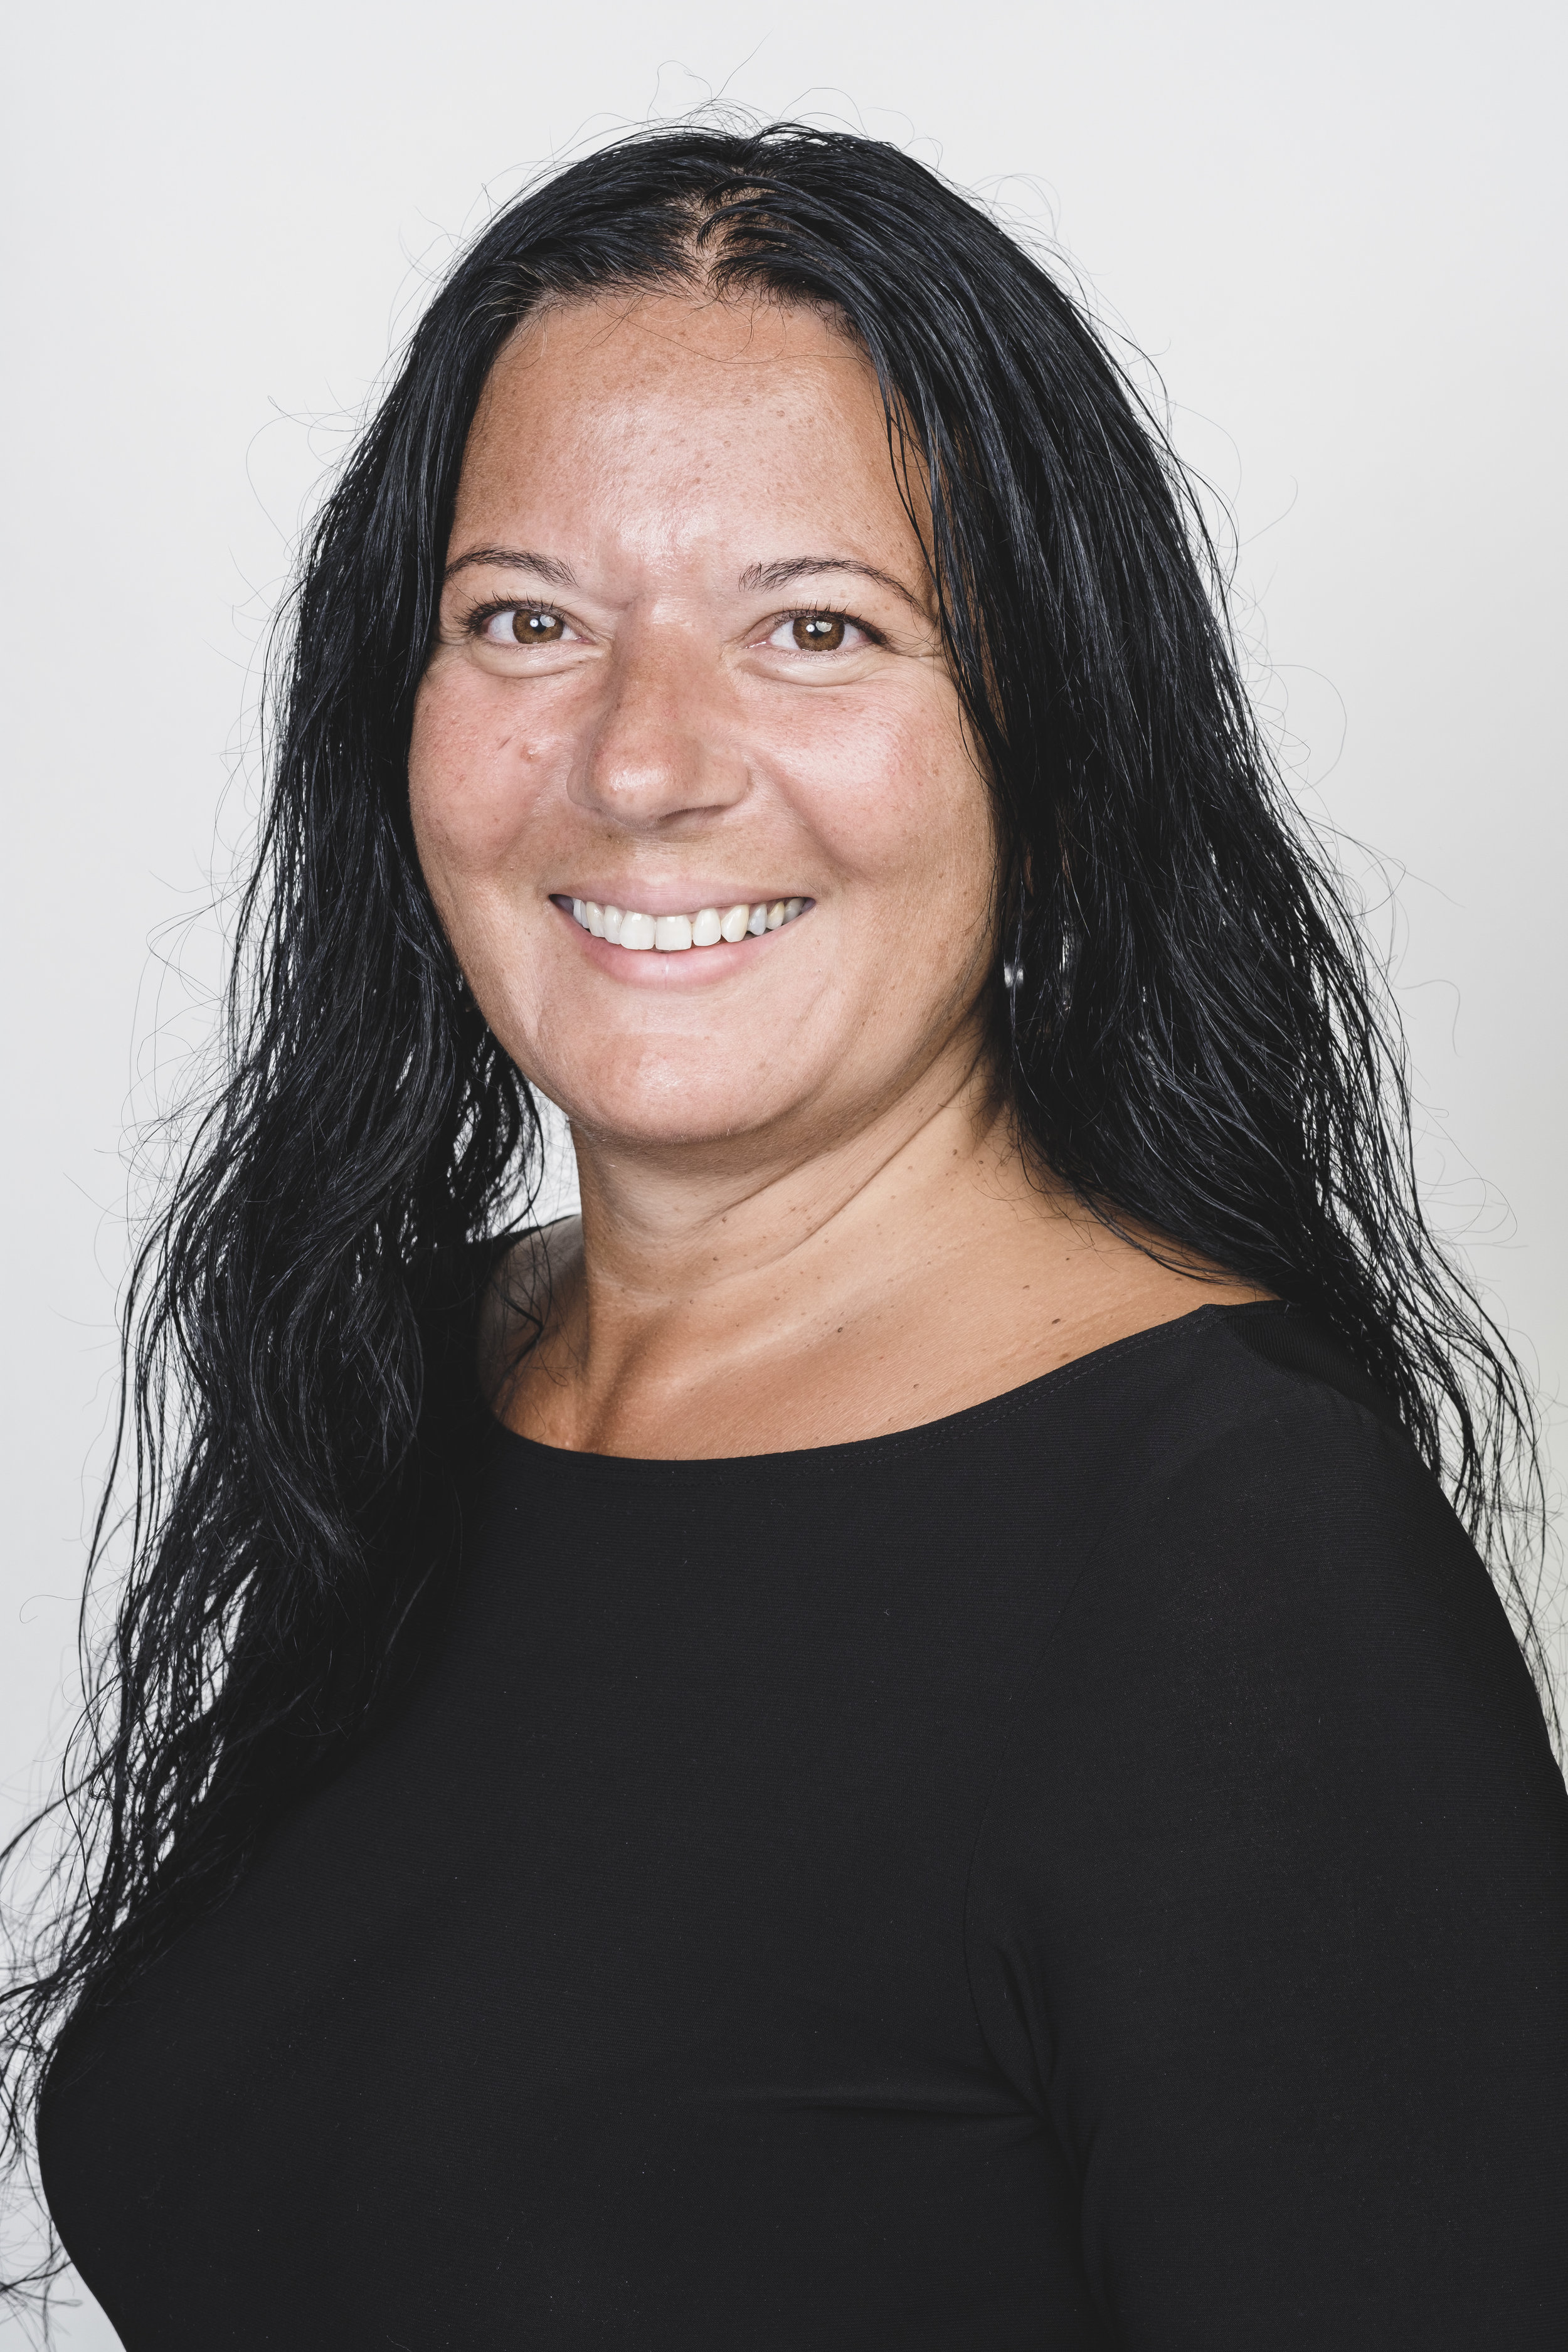 Dora Apostolopoulos, CPA, CA  Tel: (905) 695-3566 Email:  daposto@rsp.ca